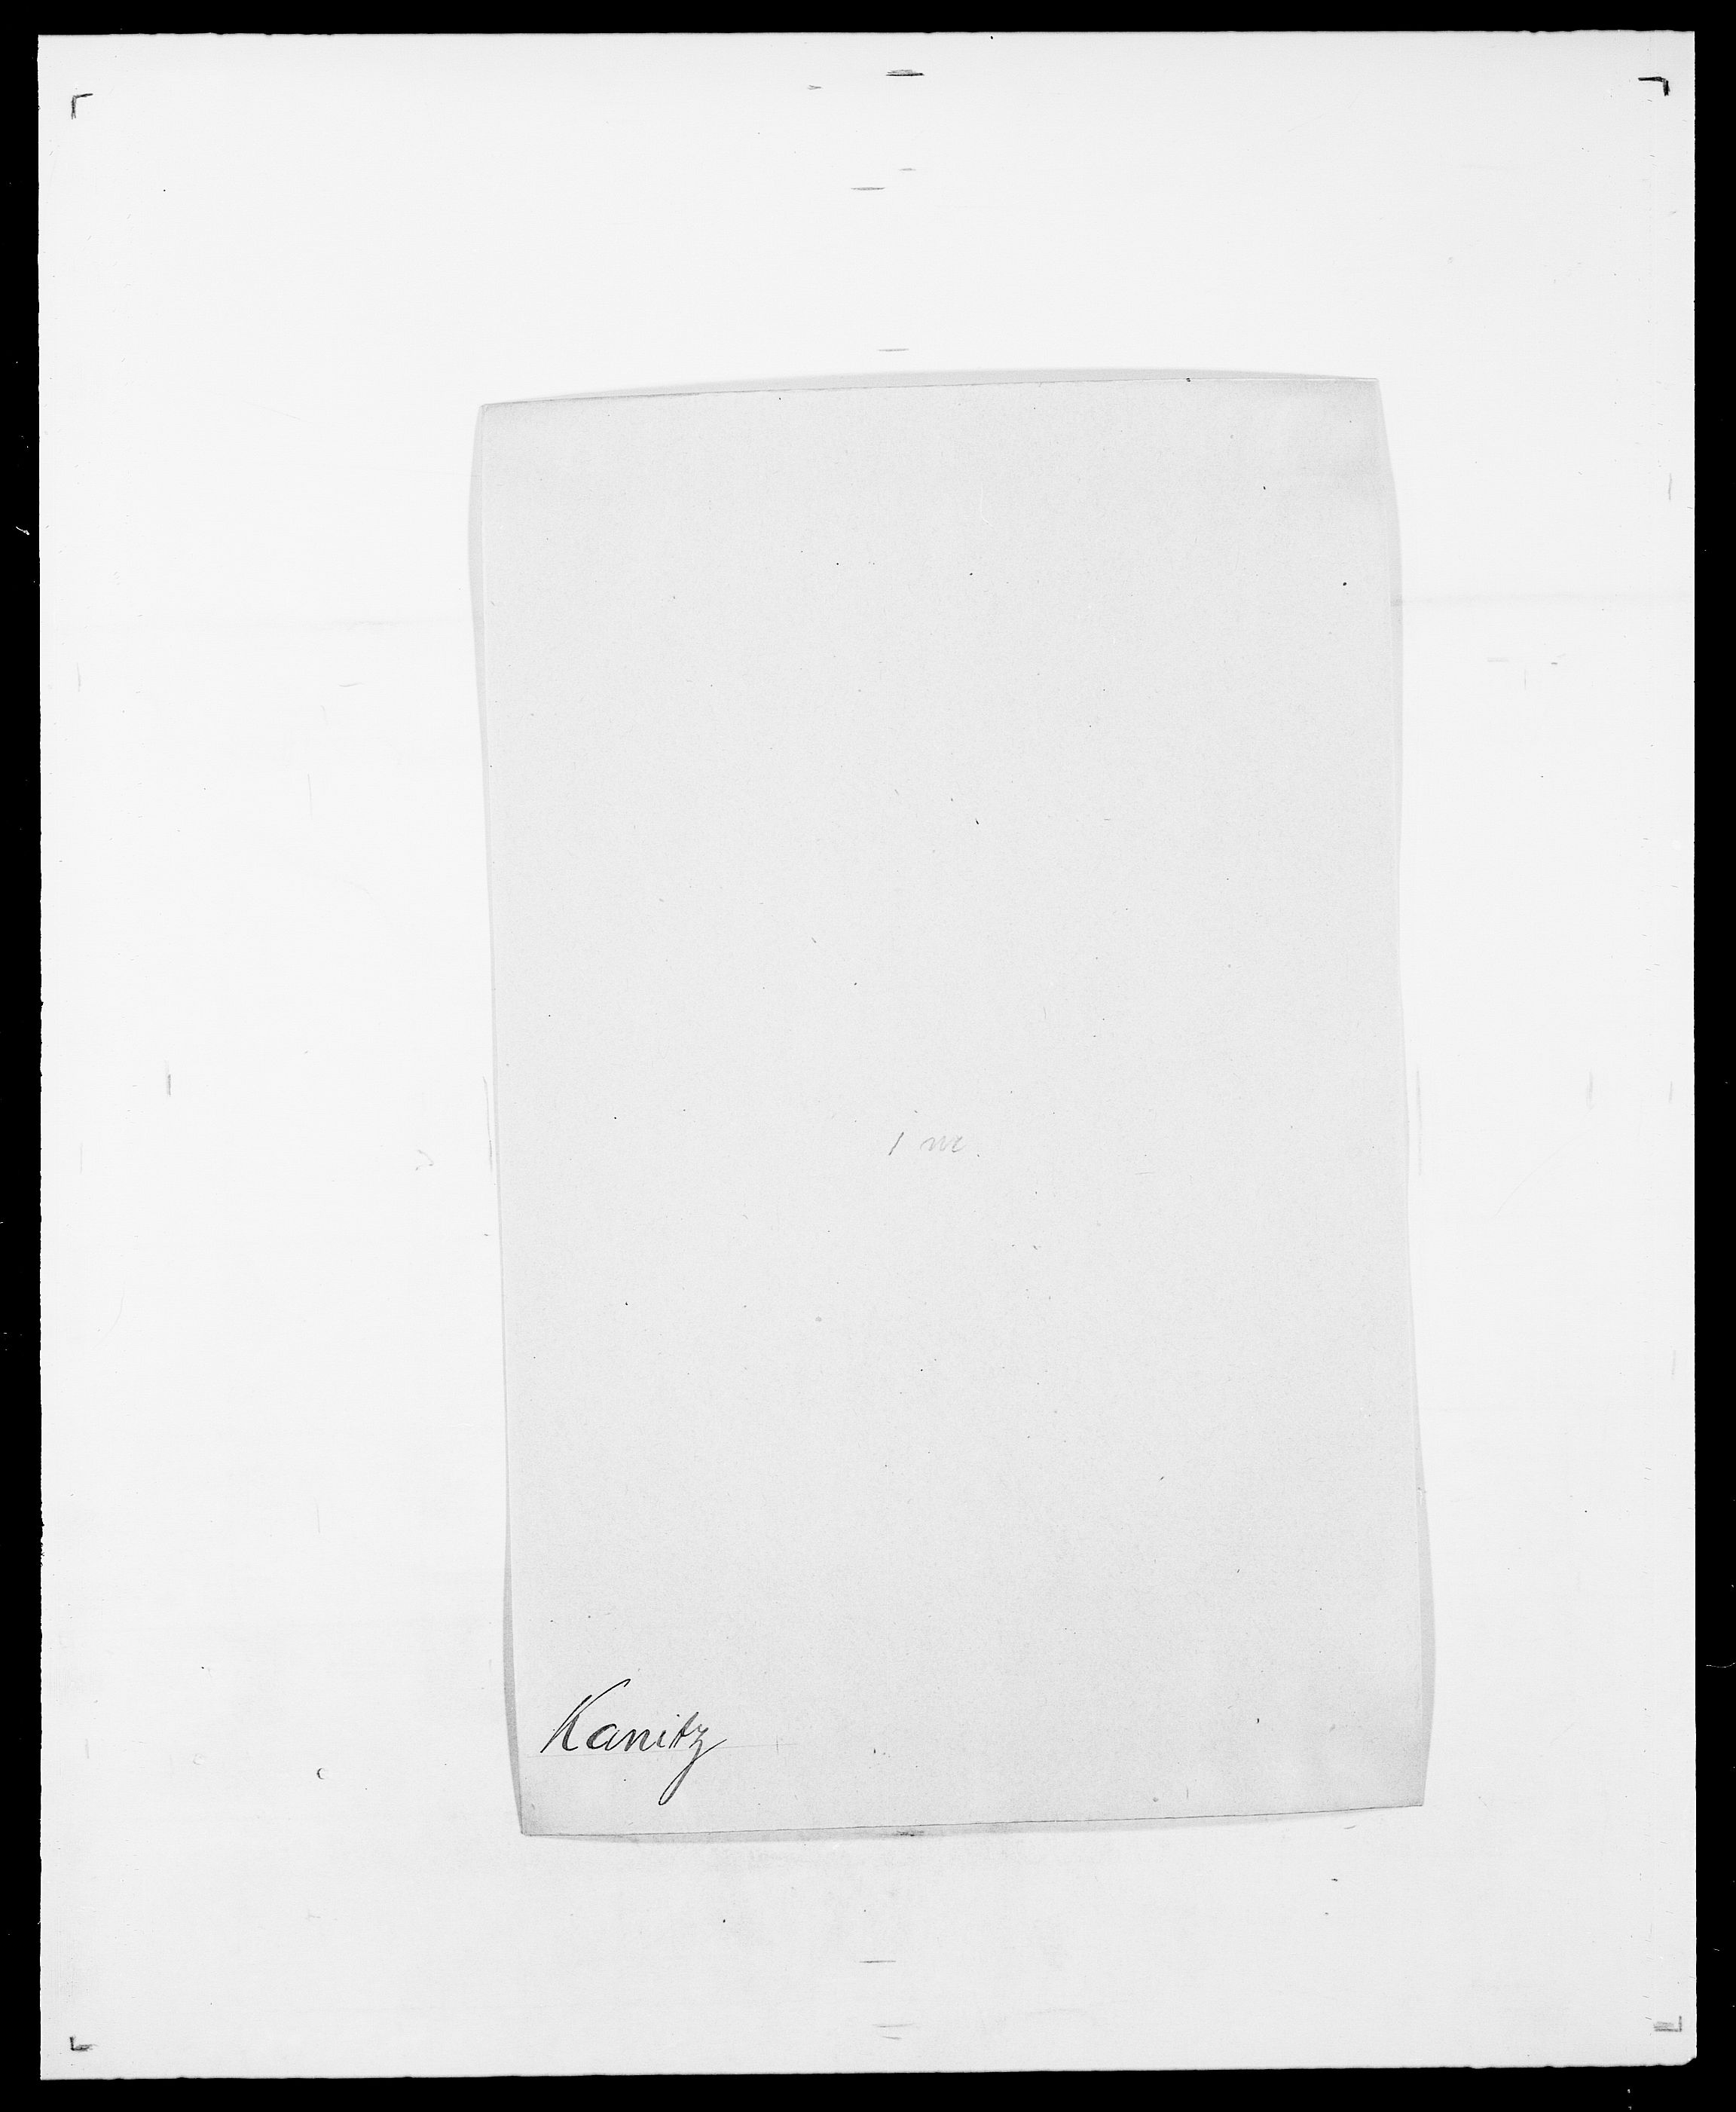 SAO, Delgobe, Charles Antoine - samling, D/Da/L0020: Irgens - Kjøsterud, s. 464